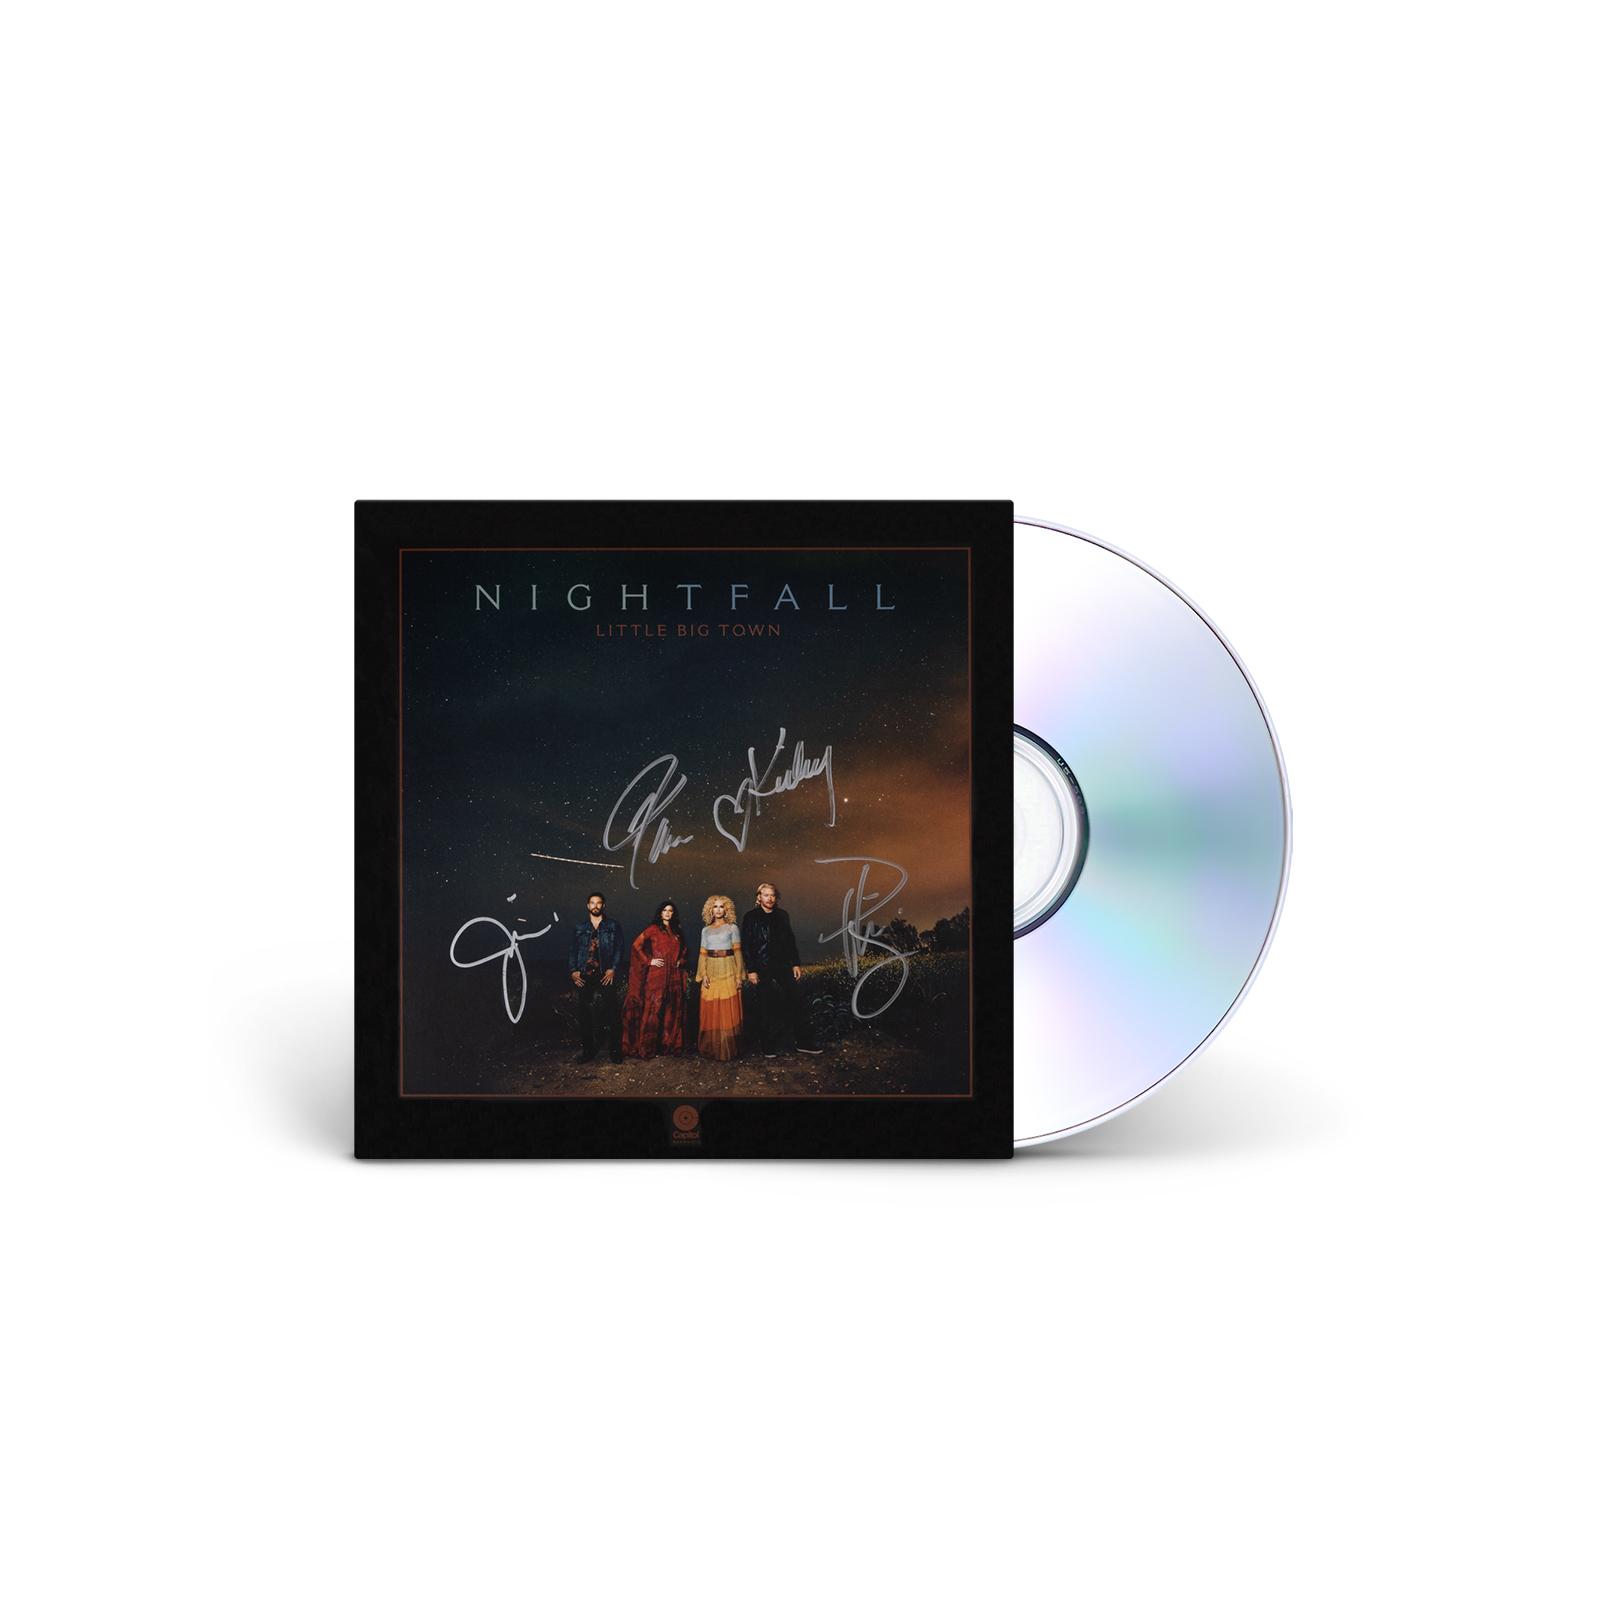 SIGNED NIGHTFALL CD